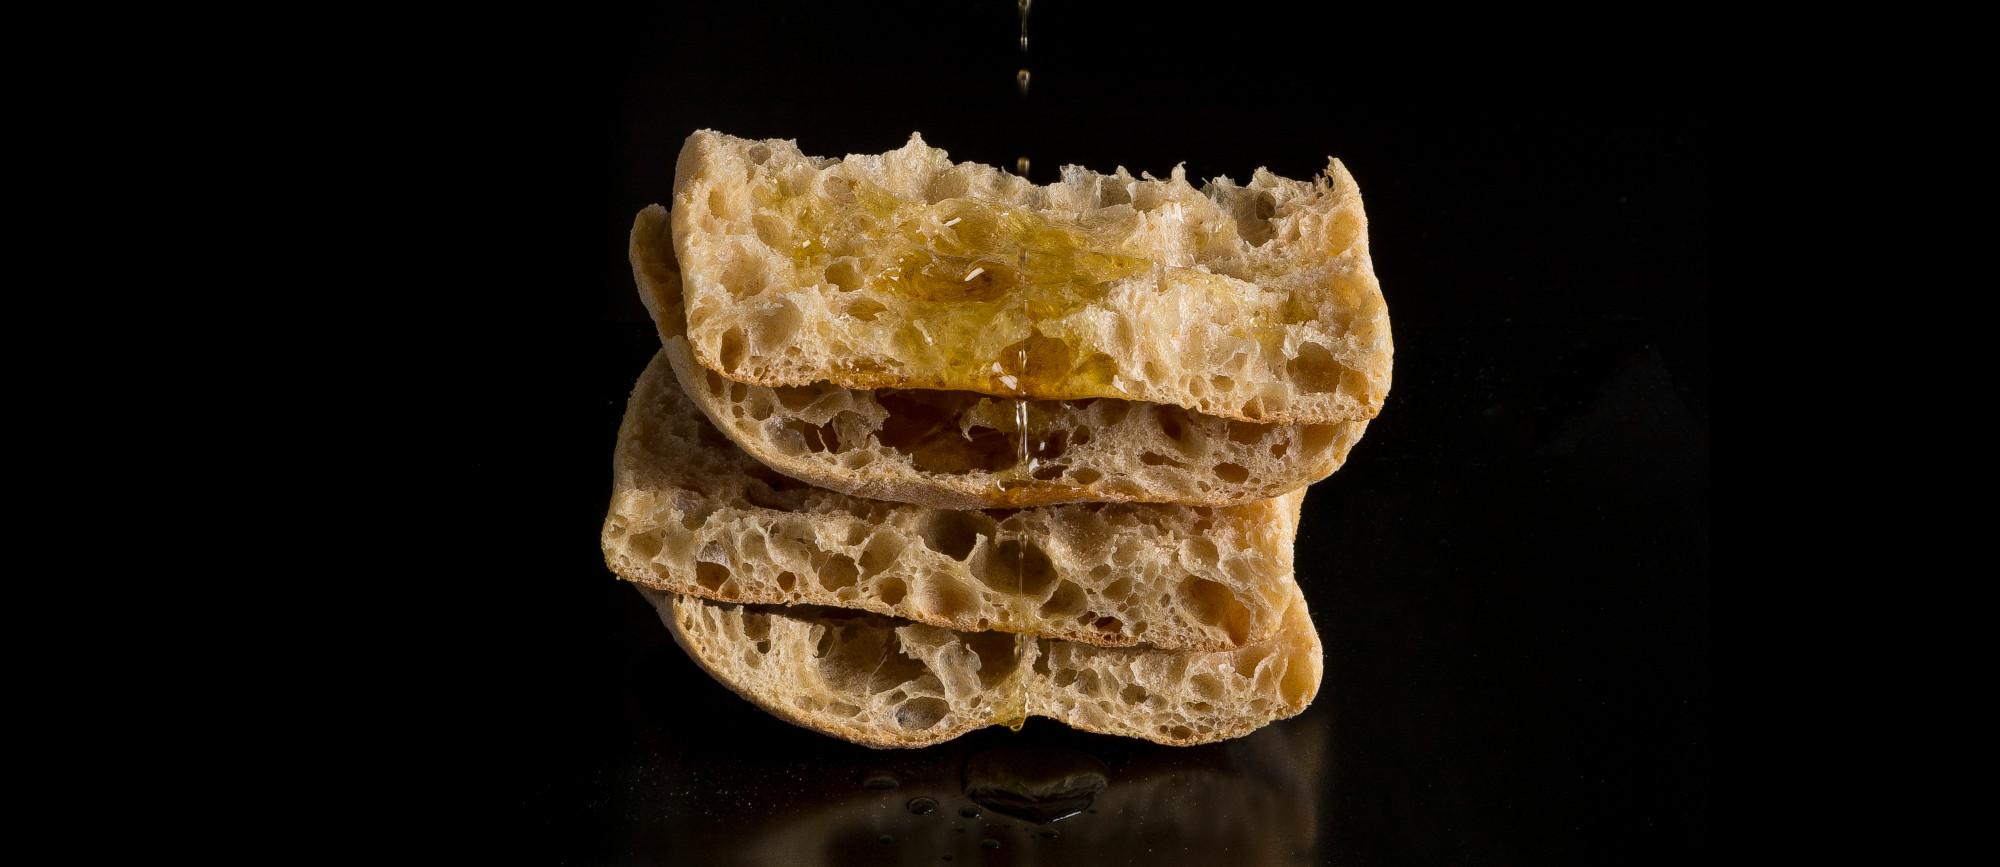 Pan de Cristal